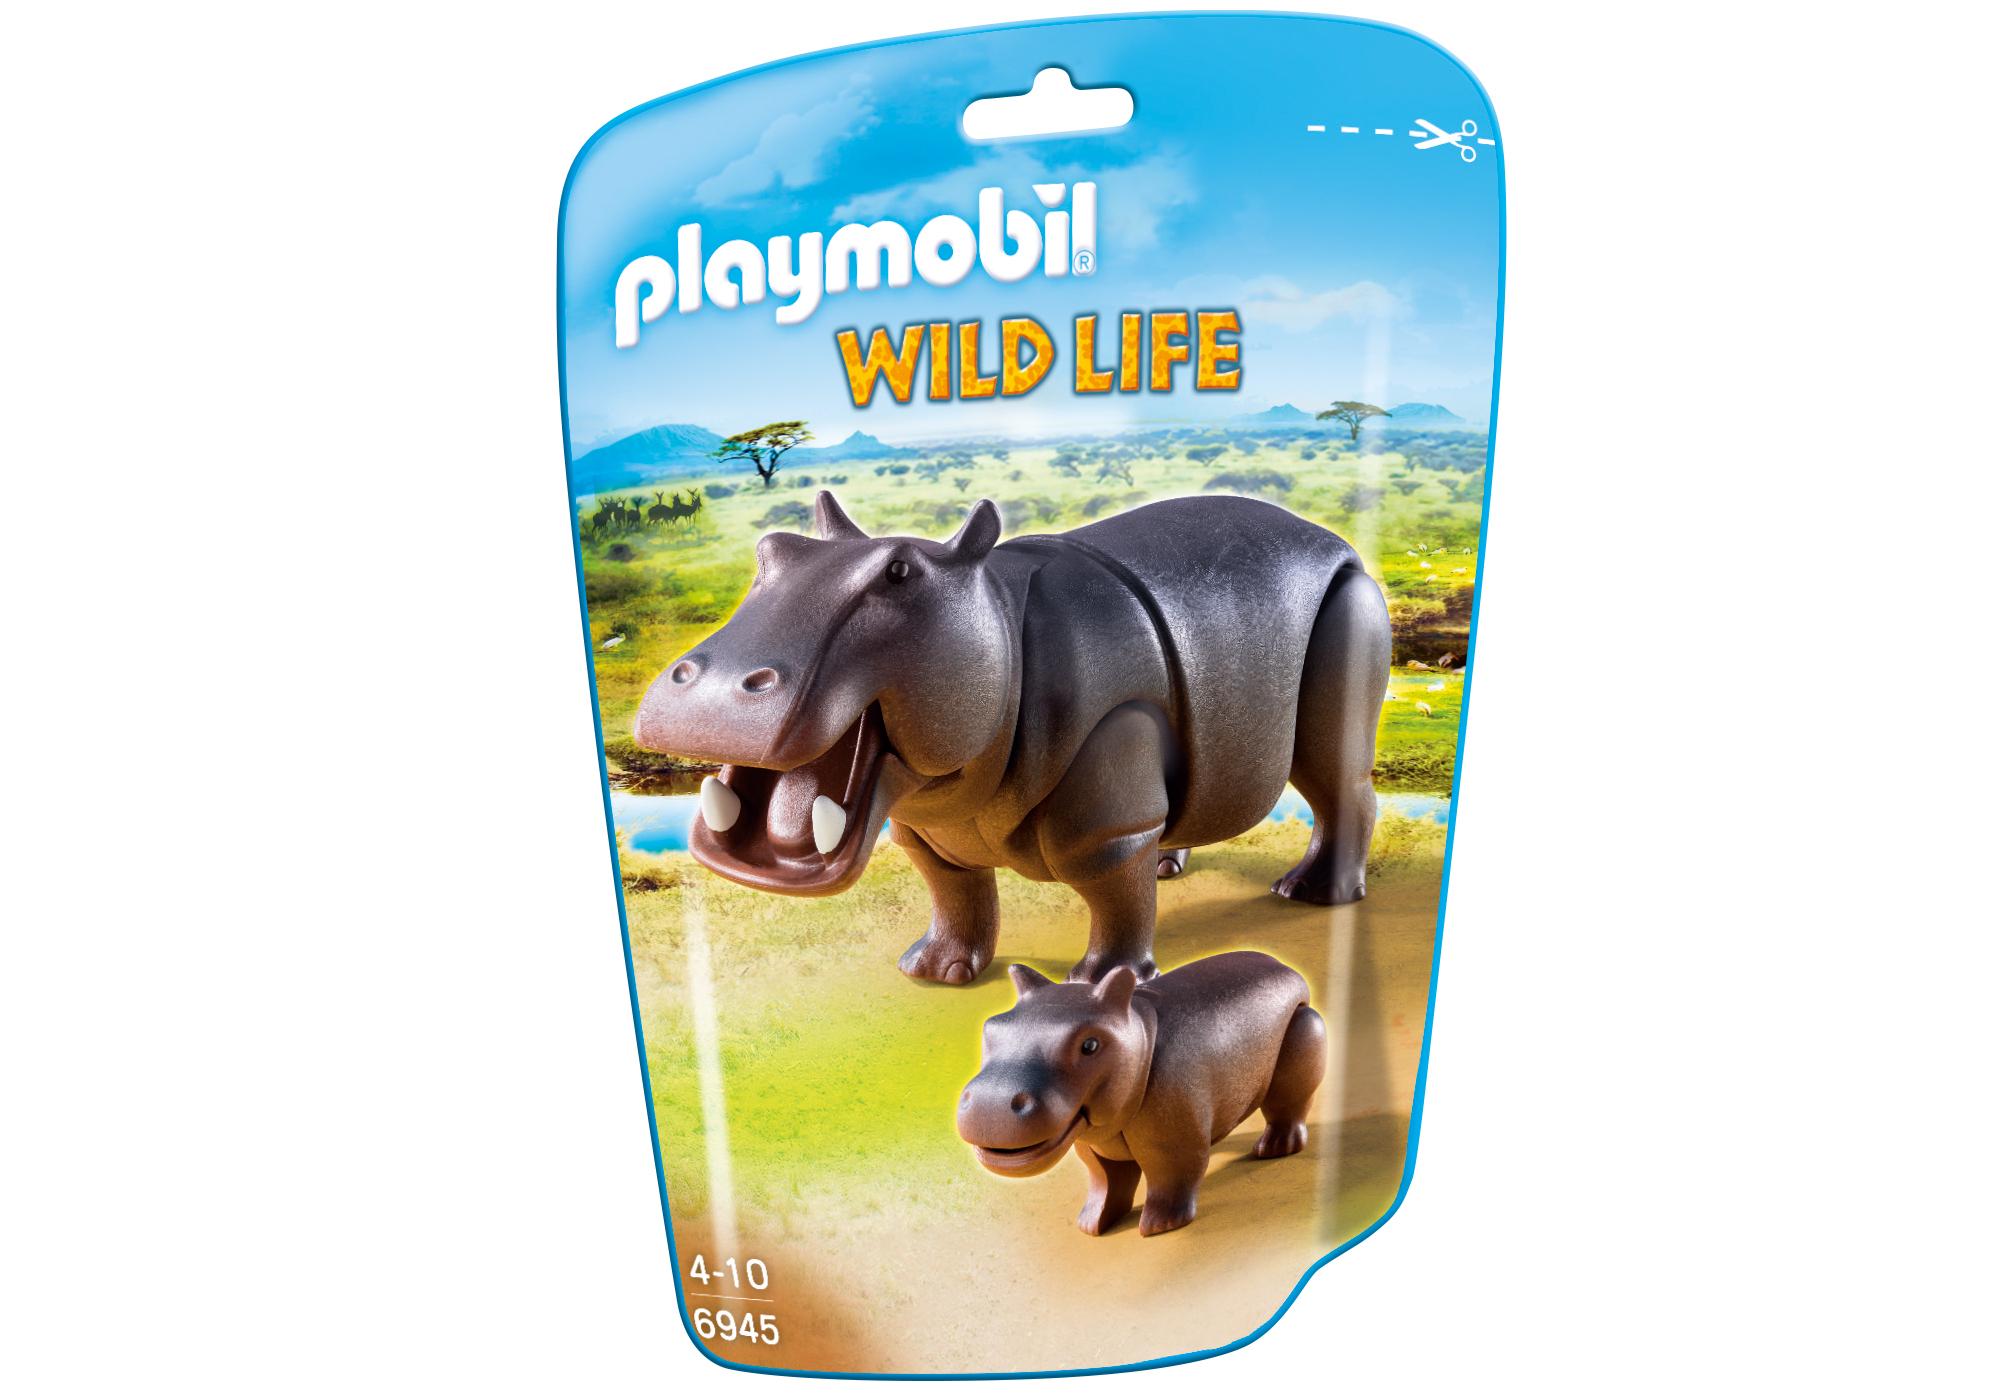 http://media.playmobil.com/i/playmobil/6945_product_box_front/Hipopótamos